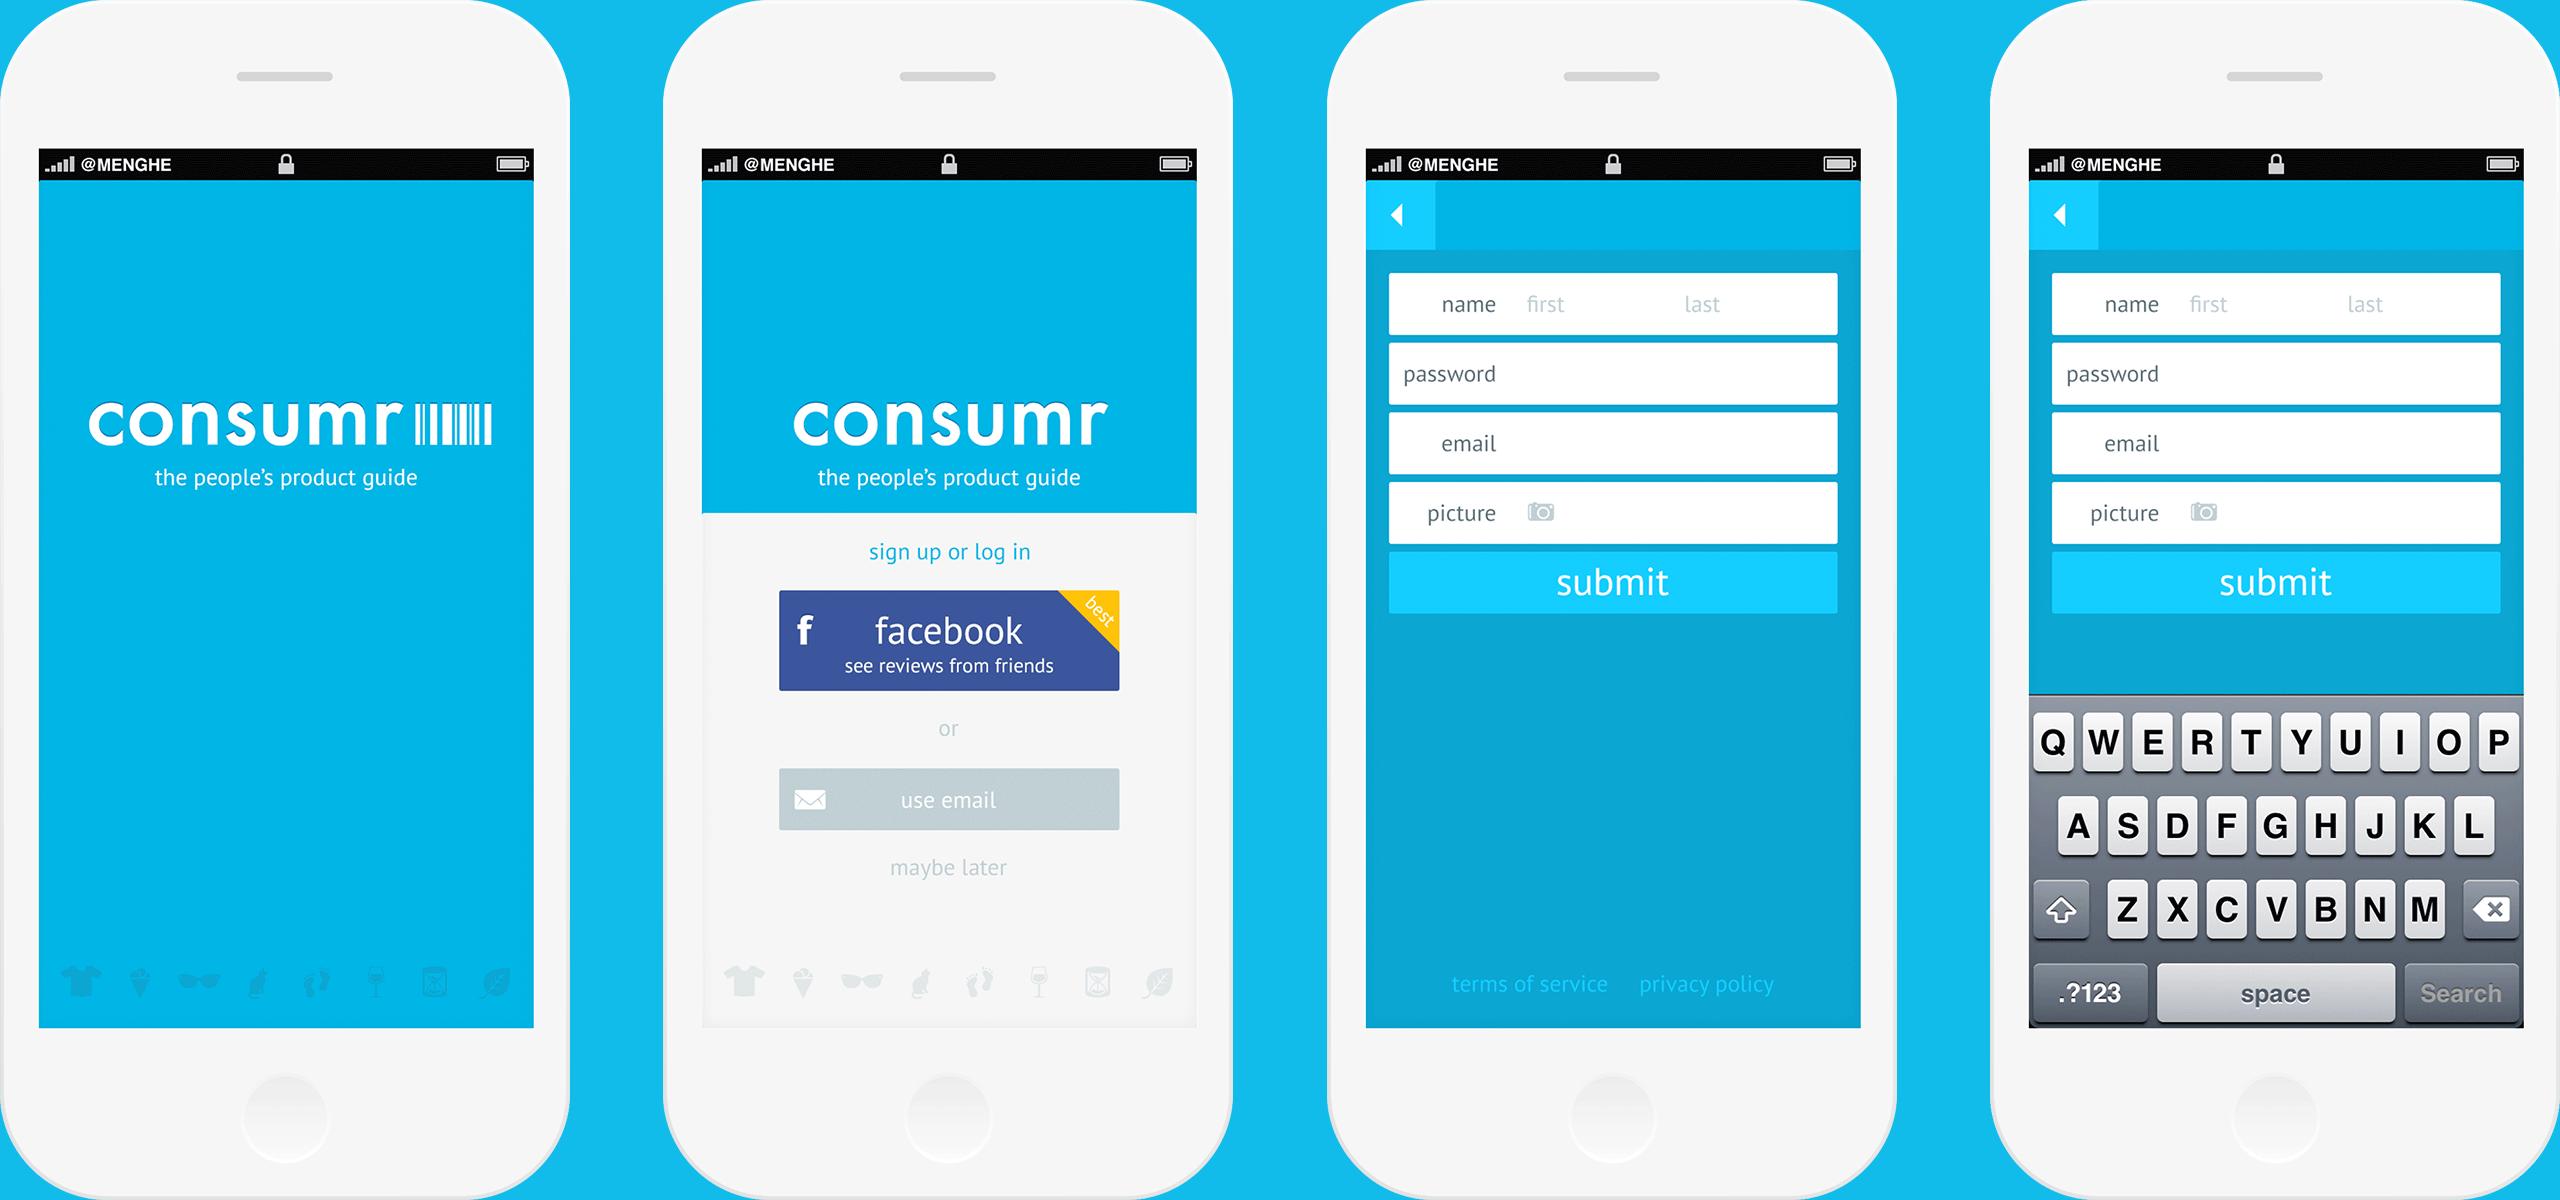 meng-he-consumr-final-app-design-signin